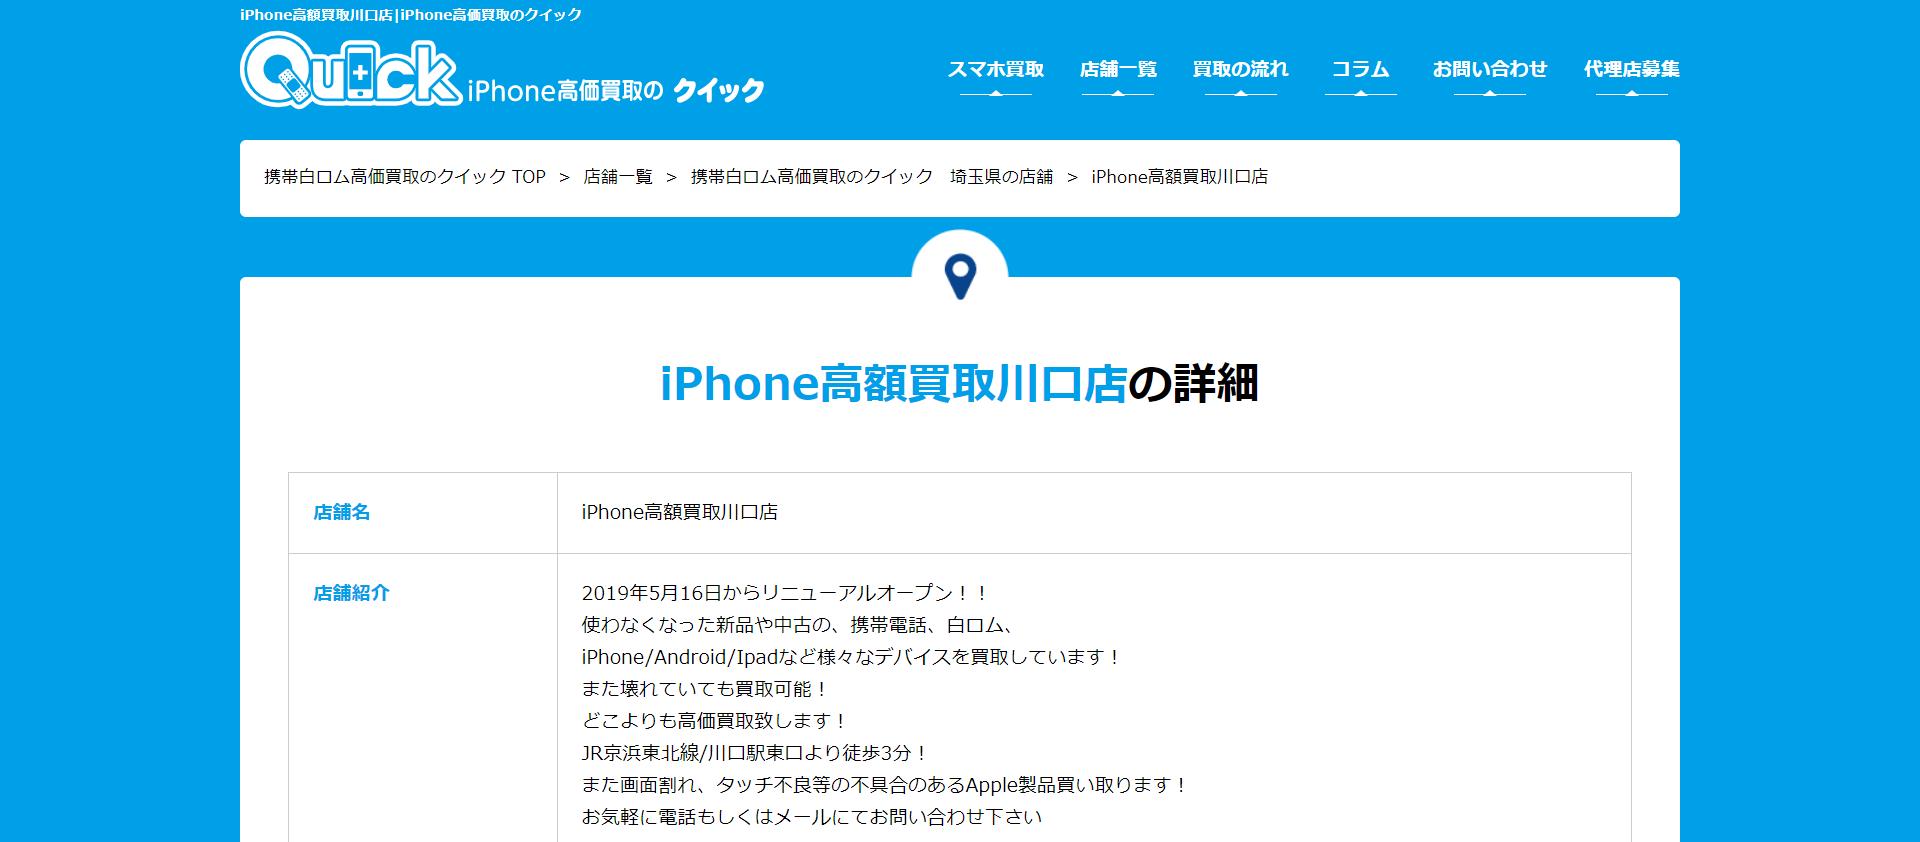 iPhone買取のクイック川口店